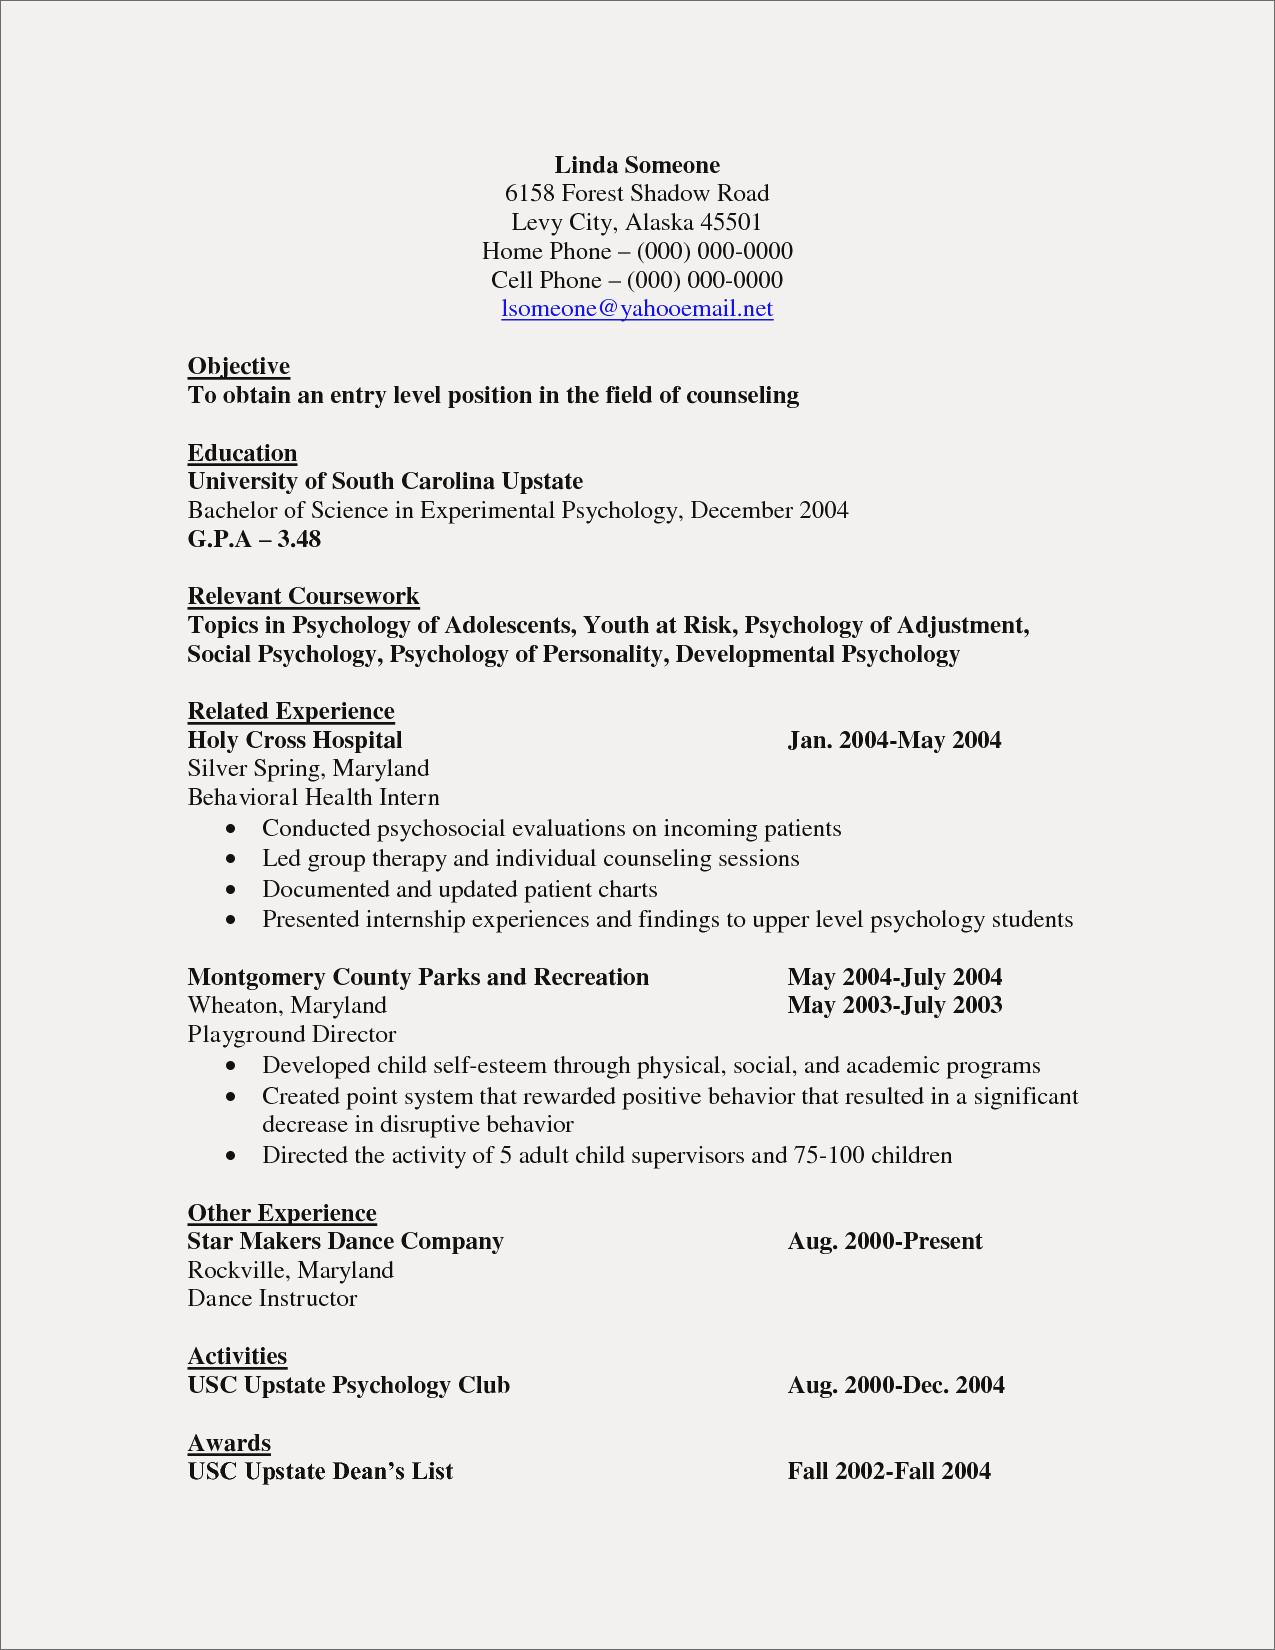 Resume For Graduate School Sample Resume Graduate School Application Psychology Save Graduate Psychology Graduate School Resume Examples Of Psychology Graduate School Resume Examples resume for graduate school|wikiresume.com